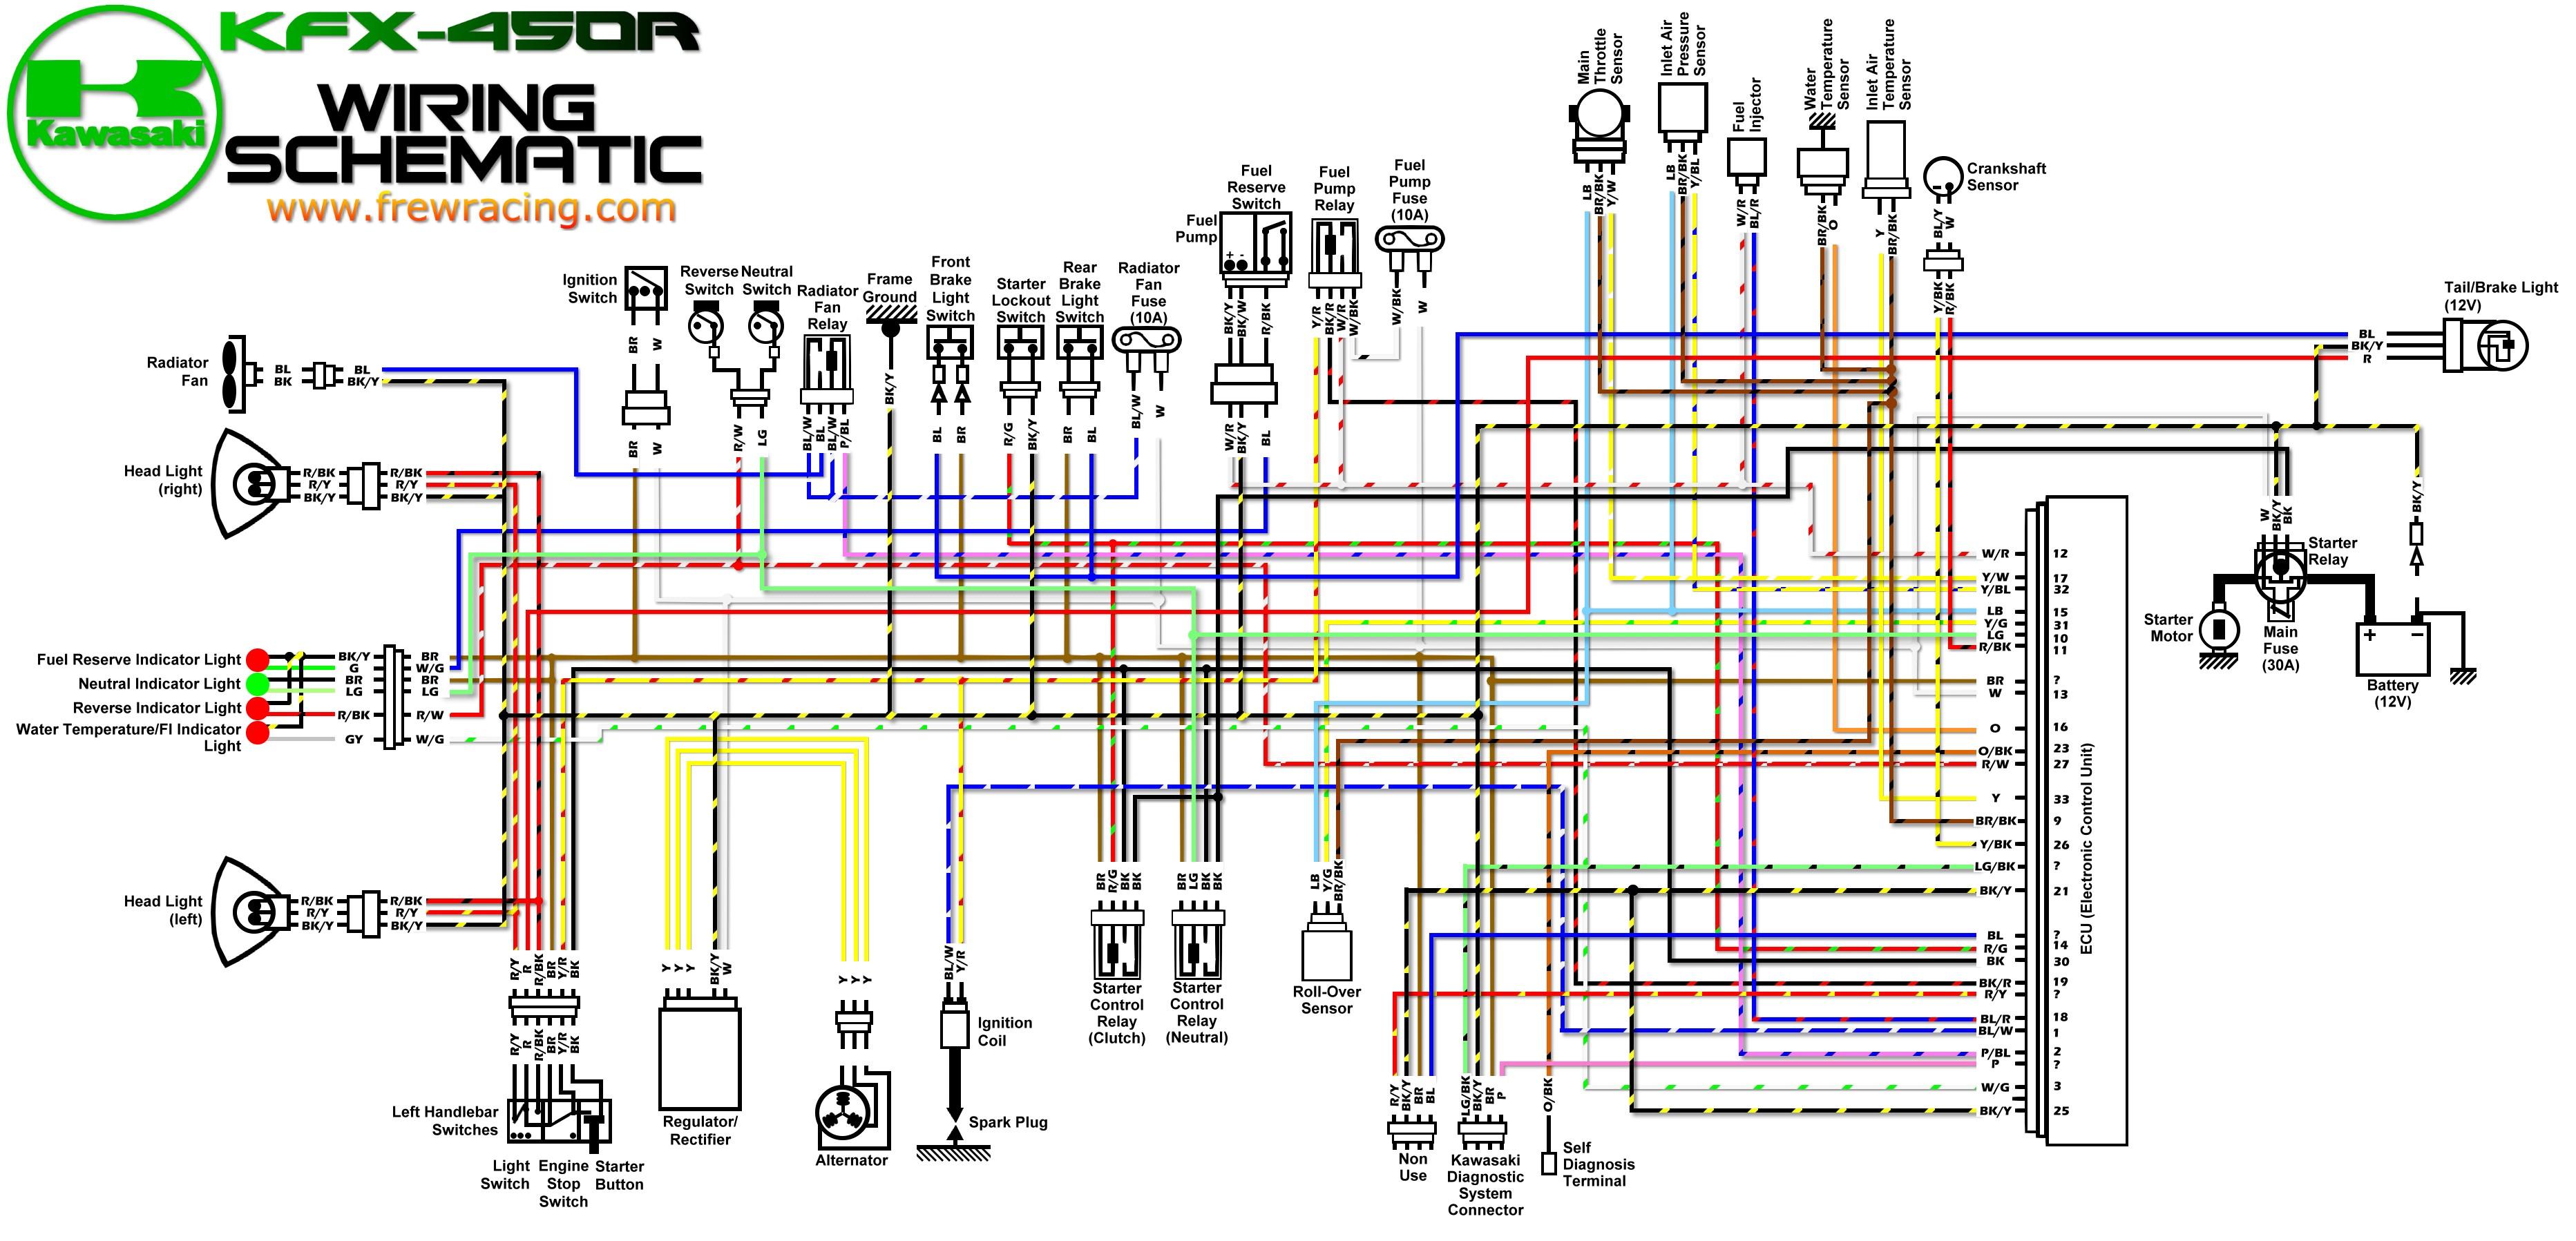 kfx 450 wiring diagram - girardin school bus fuse box for wiring diagram  schematics  wiring diagram schematics